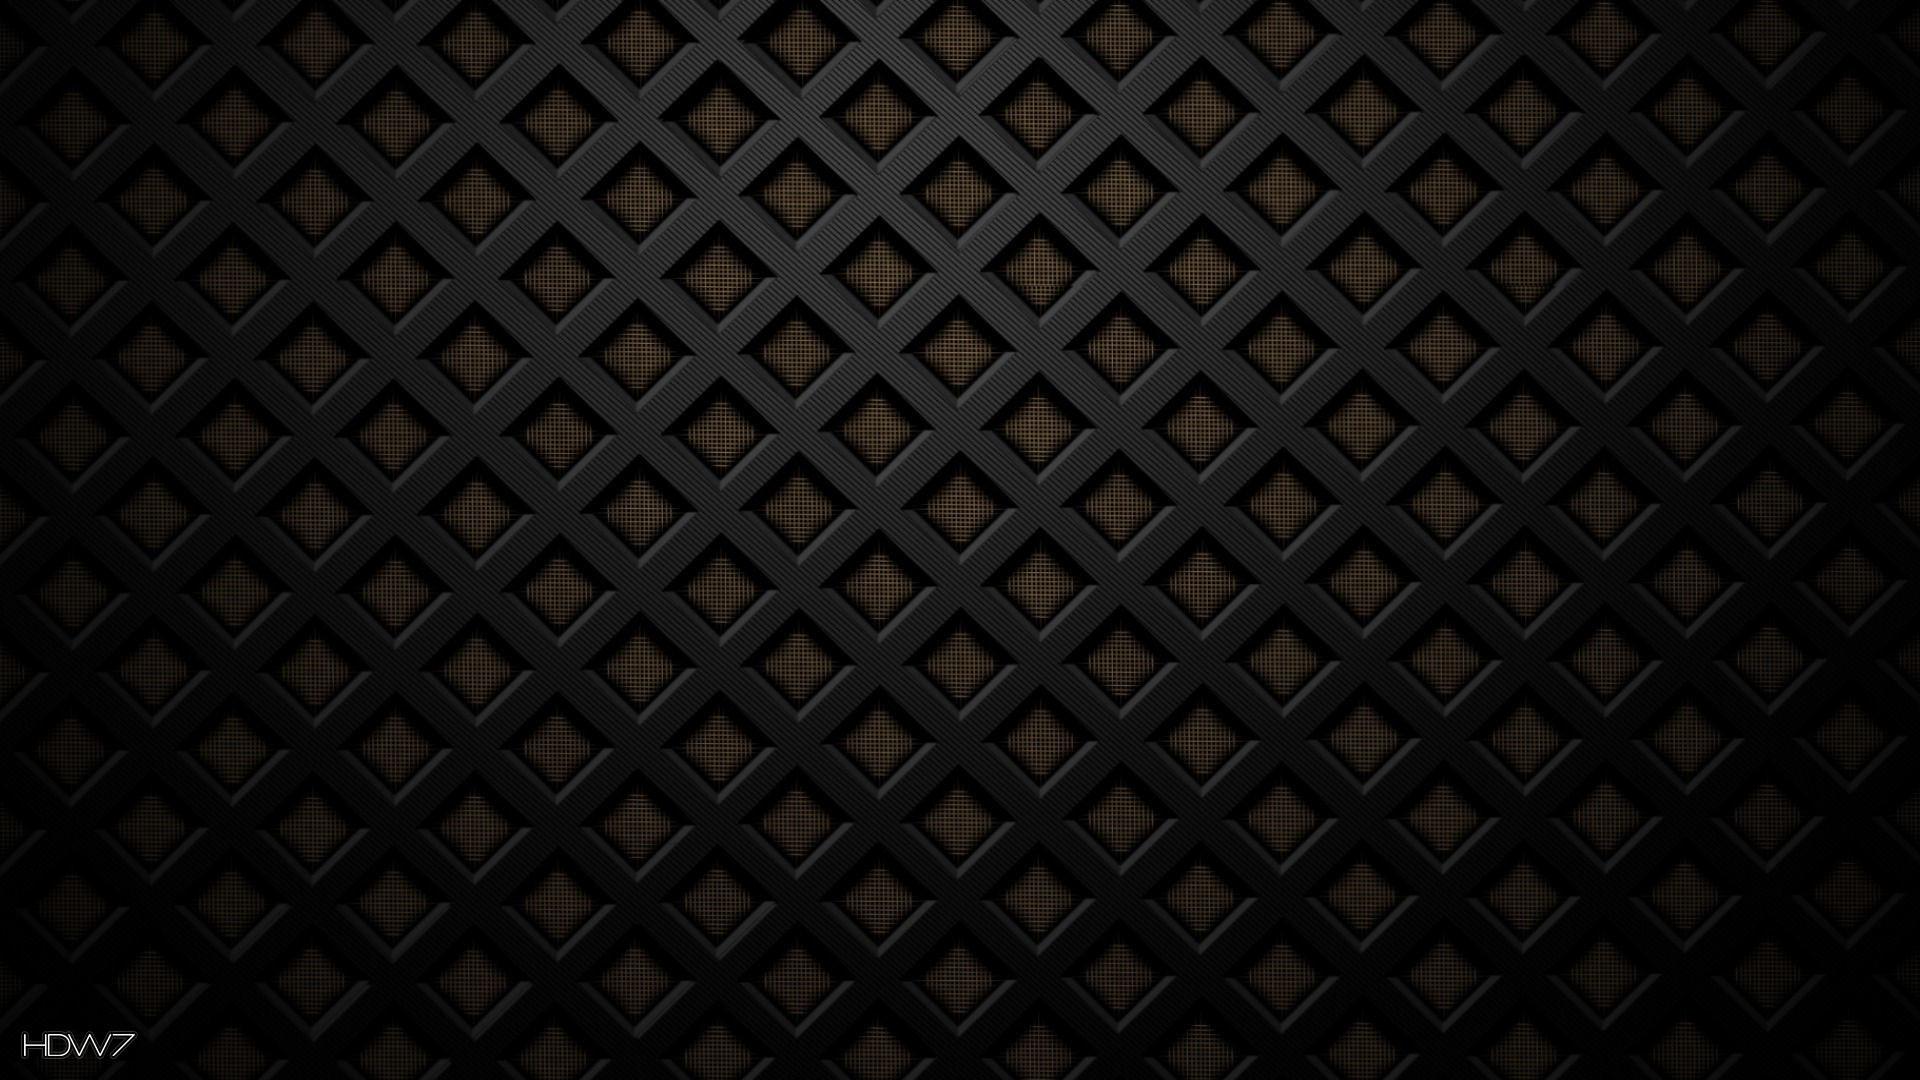 abstract dark minimalistic black textures